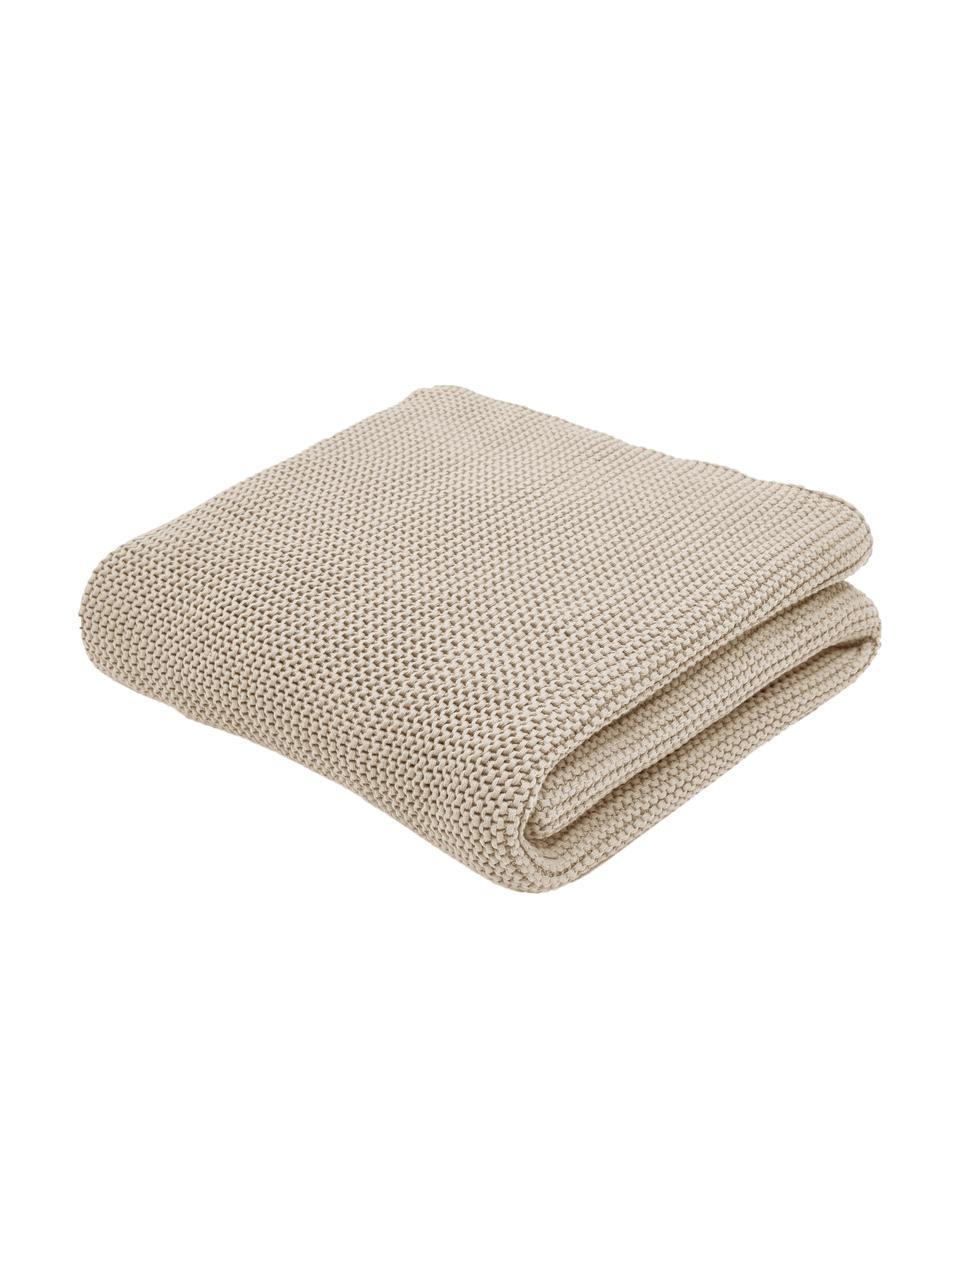 Plaid fatto a maglia beige Adalyn, 100% cotone, Beige, Larg. 150 x Lung. 200 cm